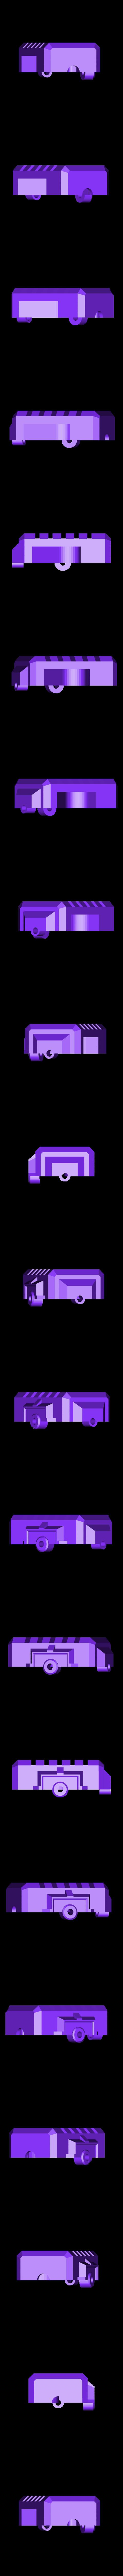 L_shoulder_1_of_2.stl Download free STL file TRANSORMERS G1 Metroplex Re-creation Add-on • Model to 3D print, sickofyou